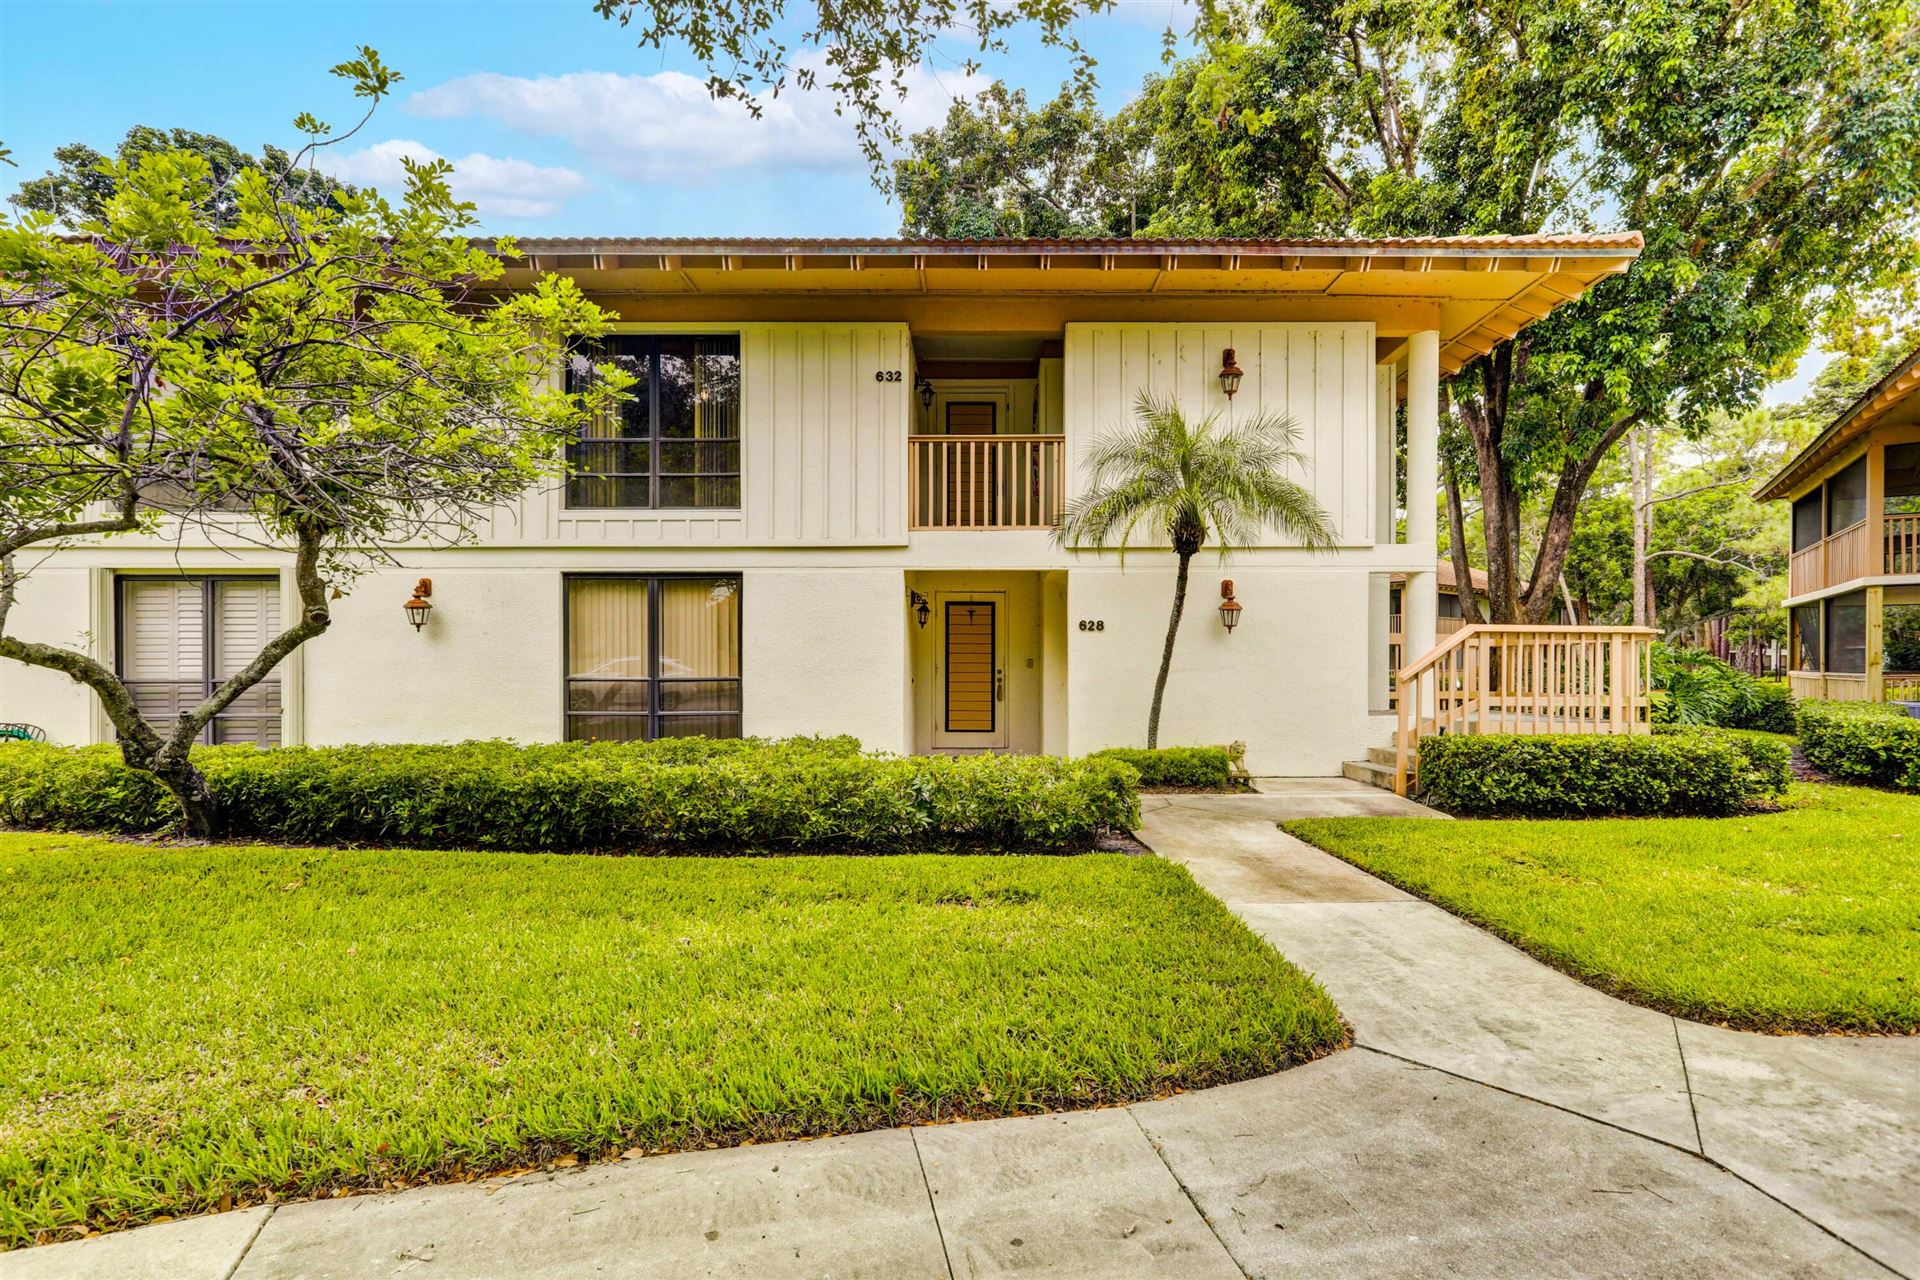 Photo of 632 Brackenwood Cove, Palm Beach Gardens, FL 33418 (MLS # RX-10743017)